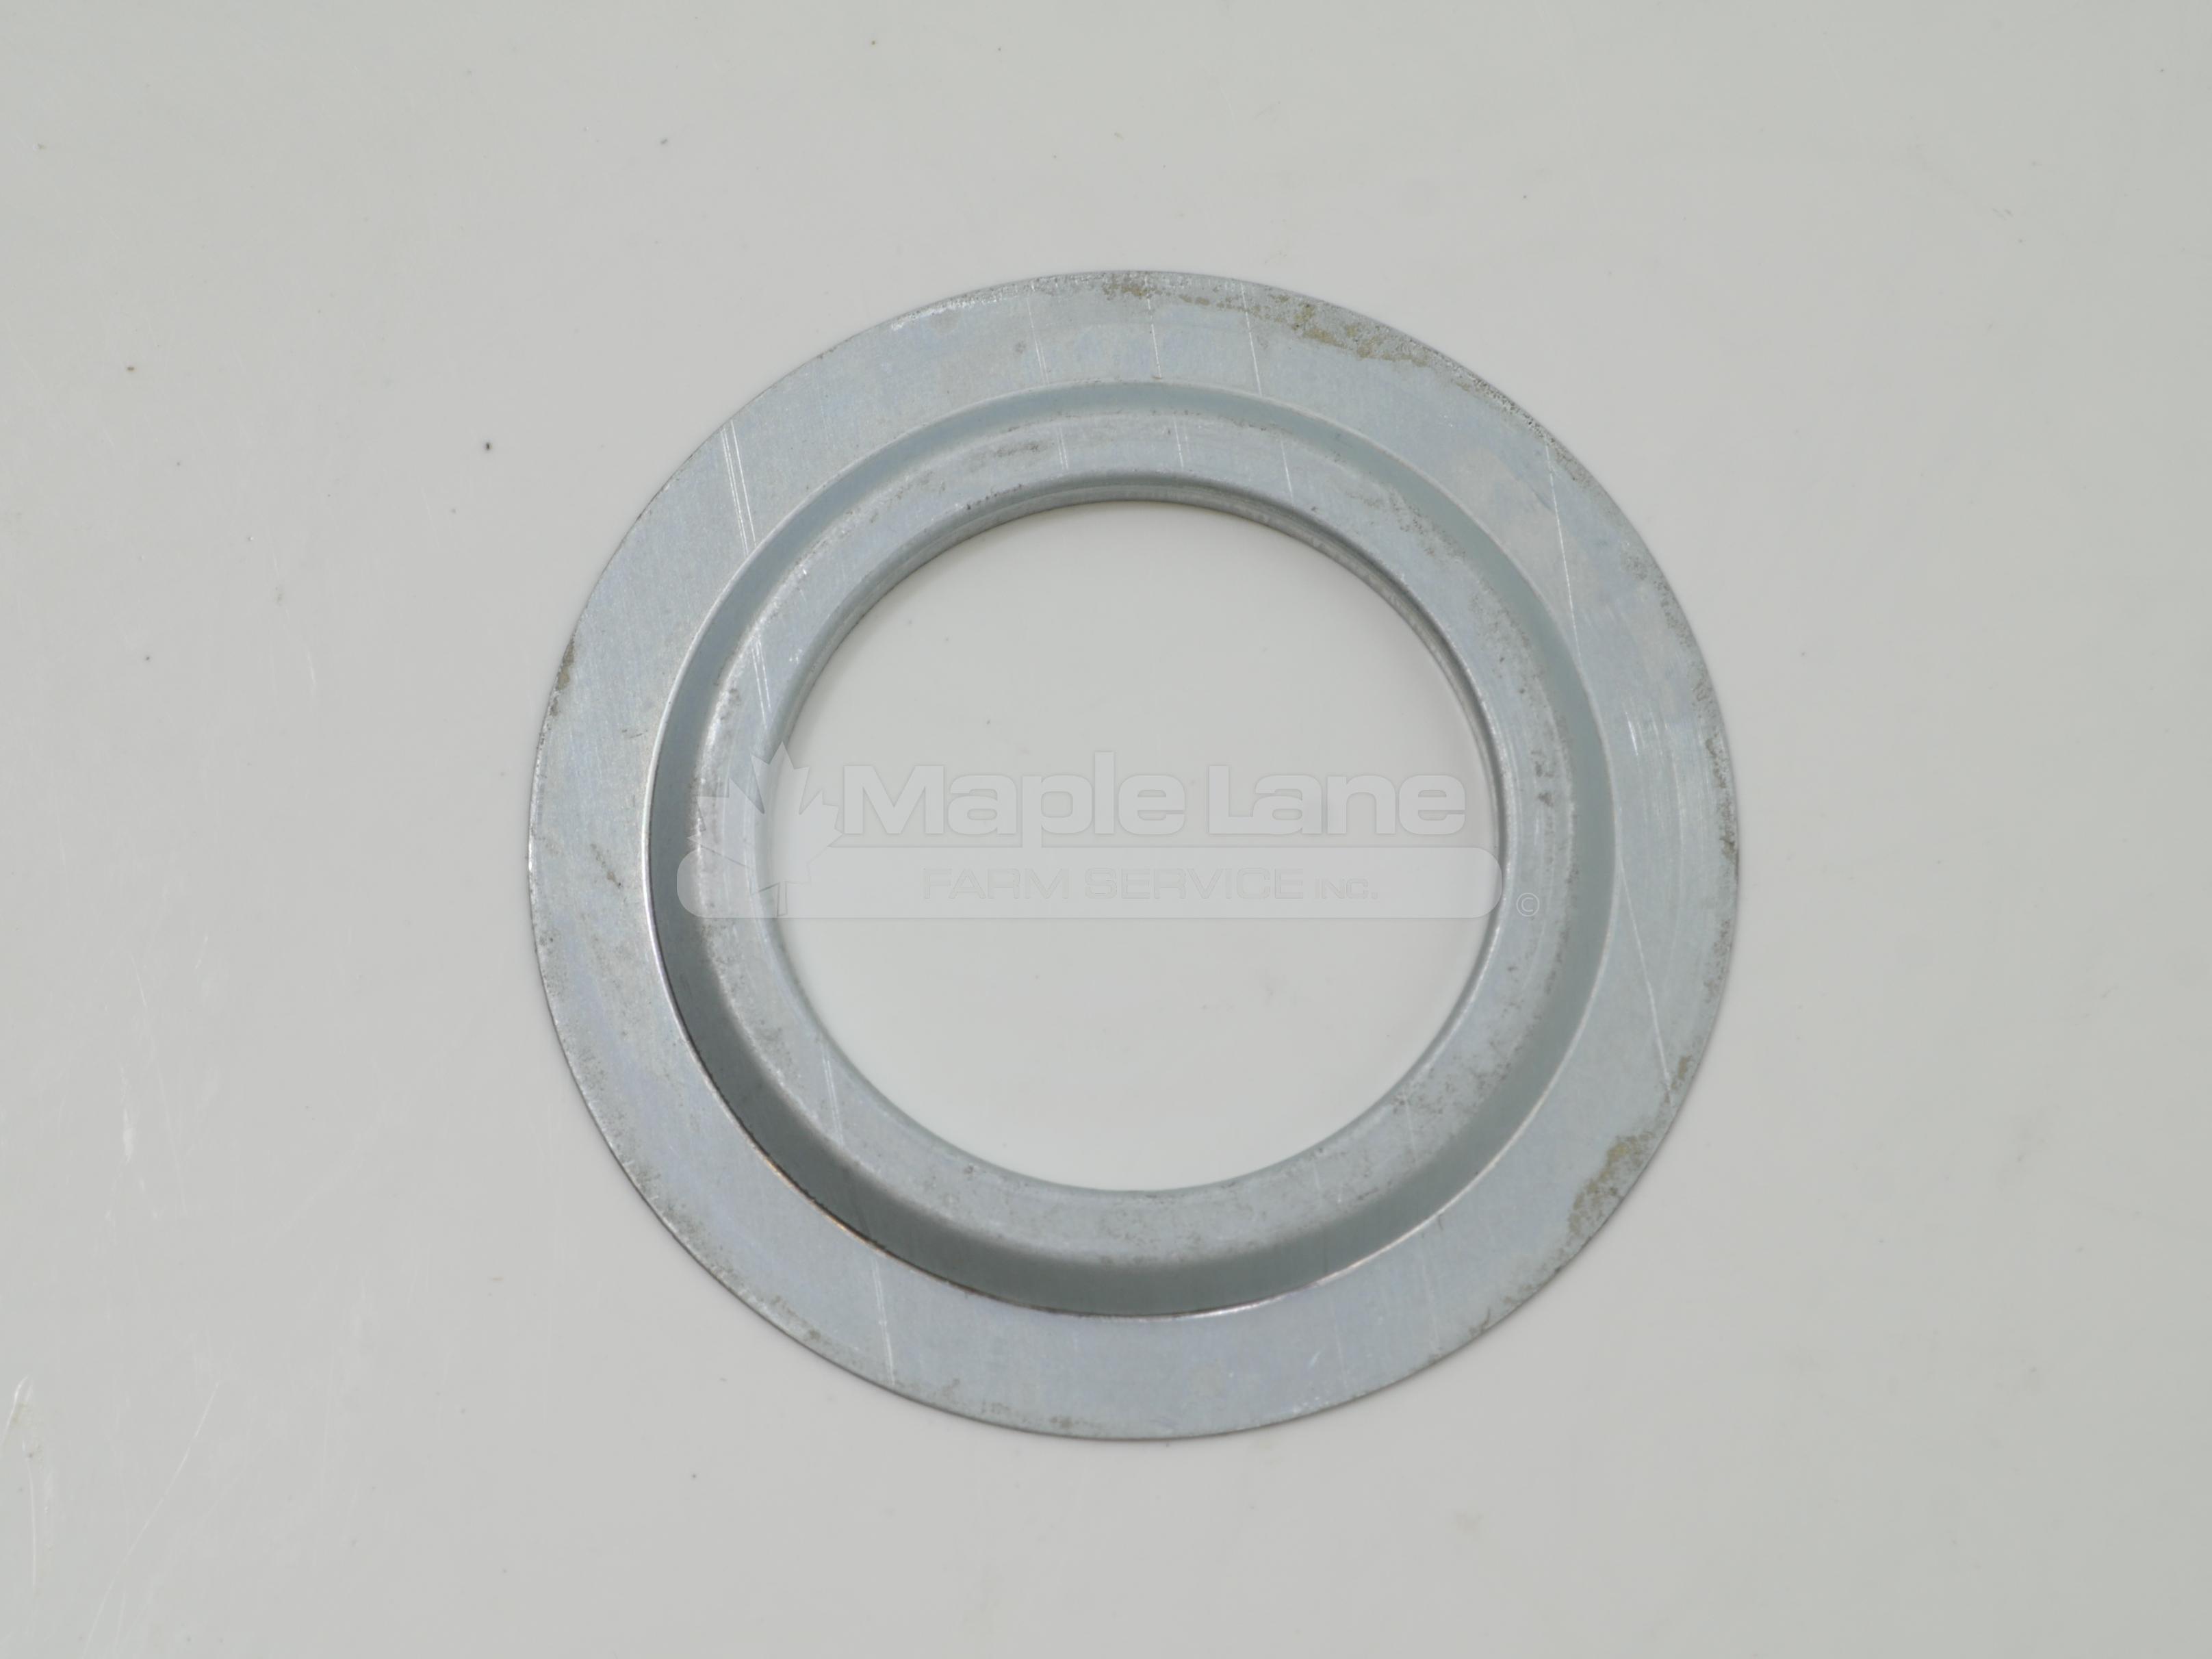 526061 Bearing Shield